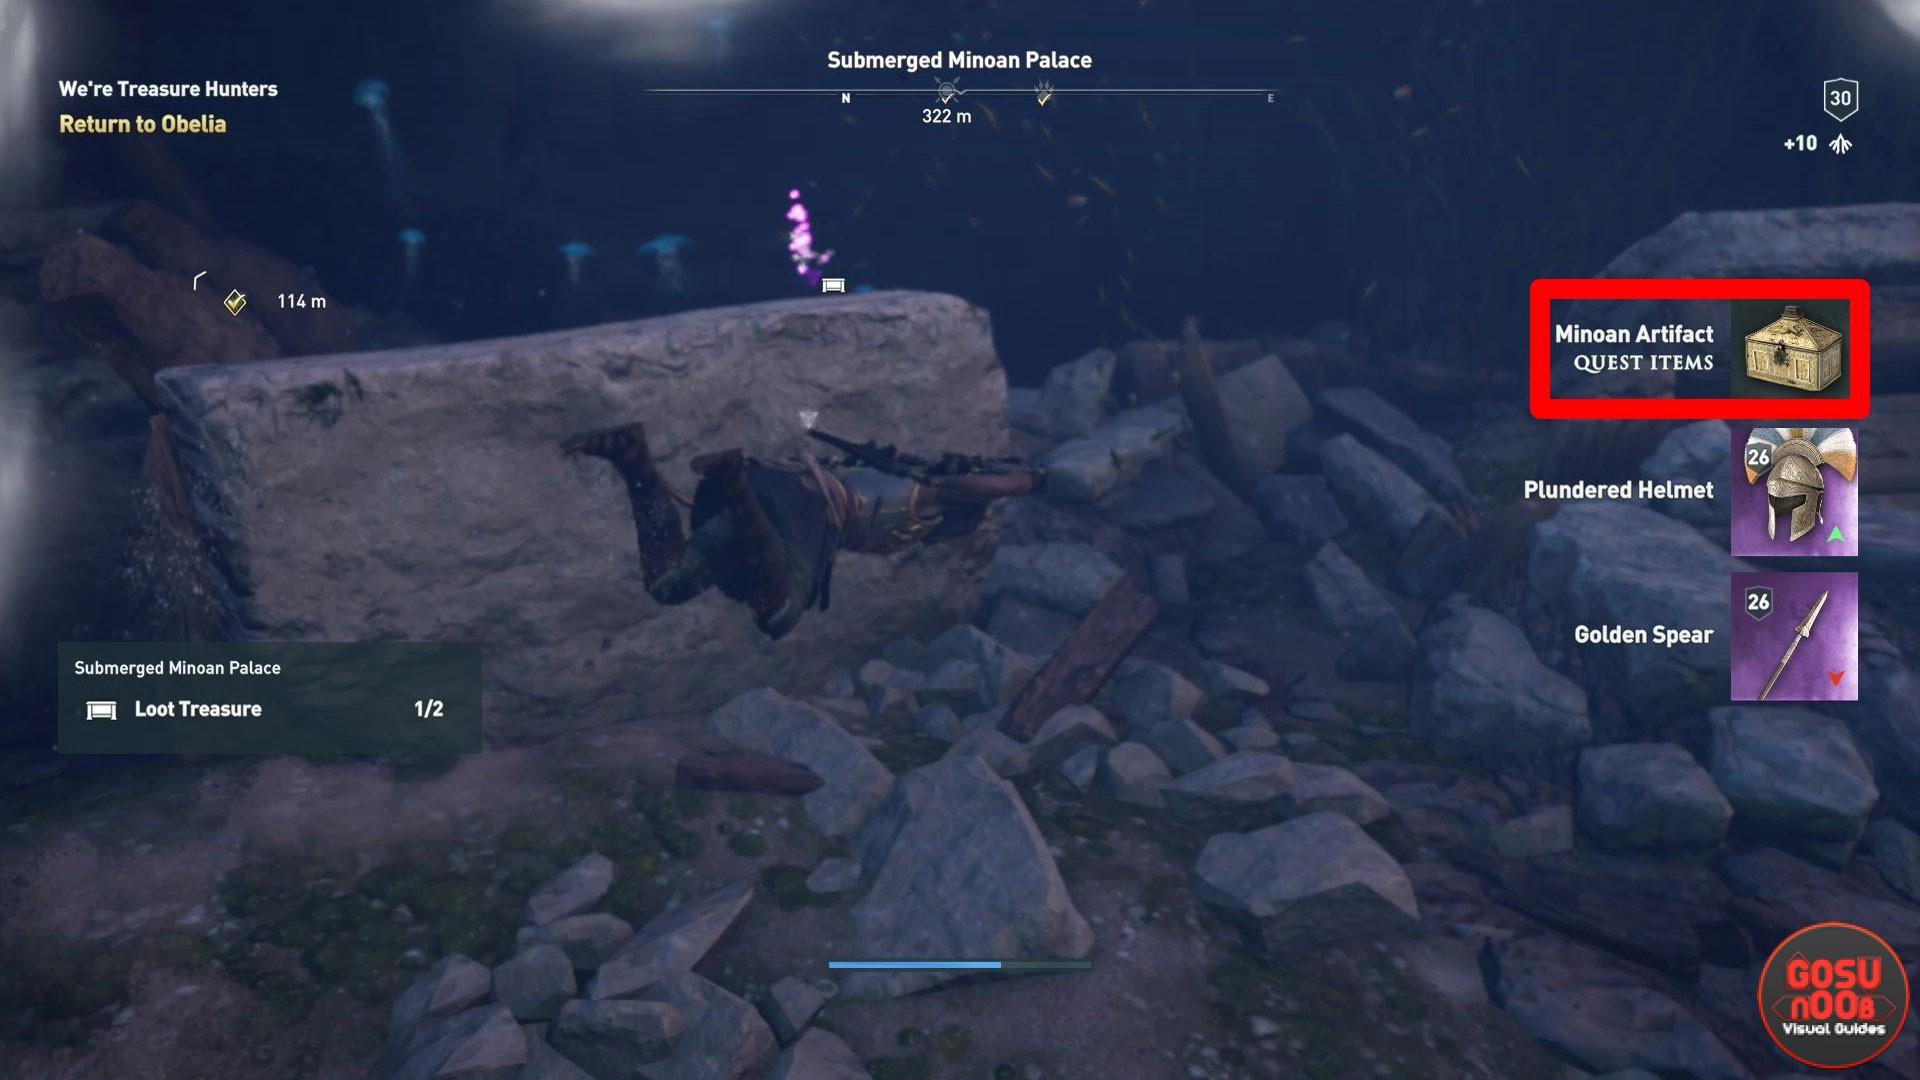 Assassin S Creed Odyssey Submerged Minoan Palace Sunken Artifact